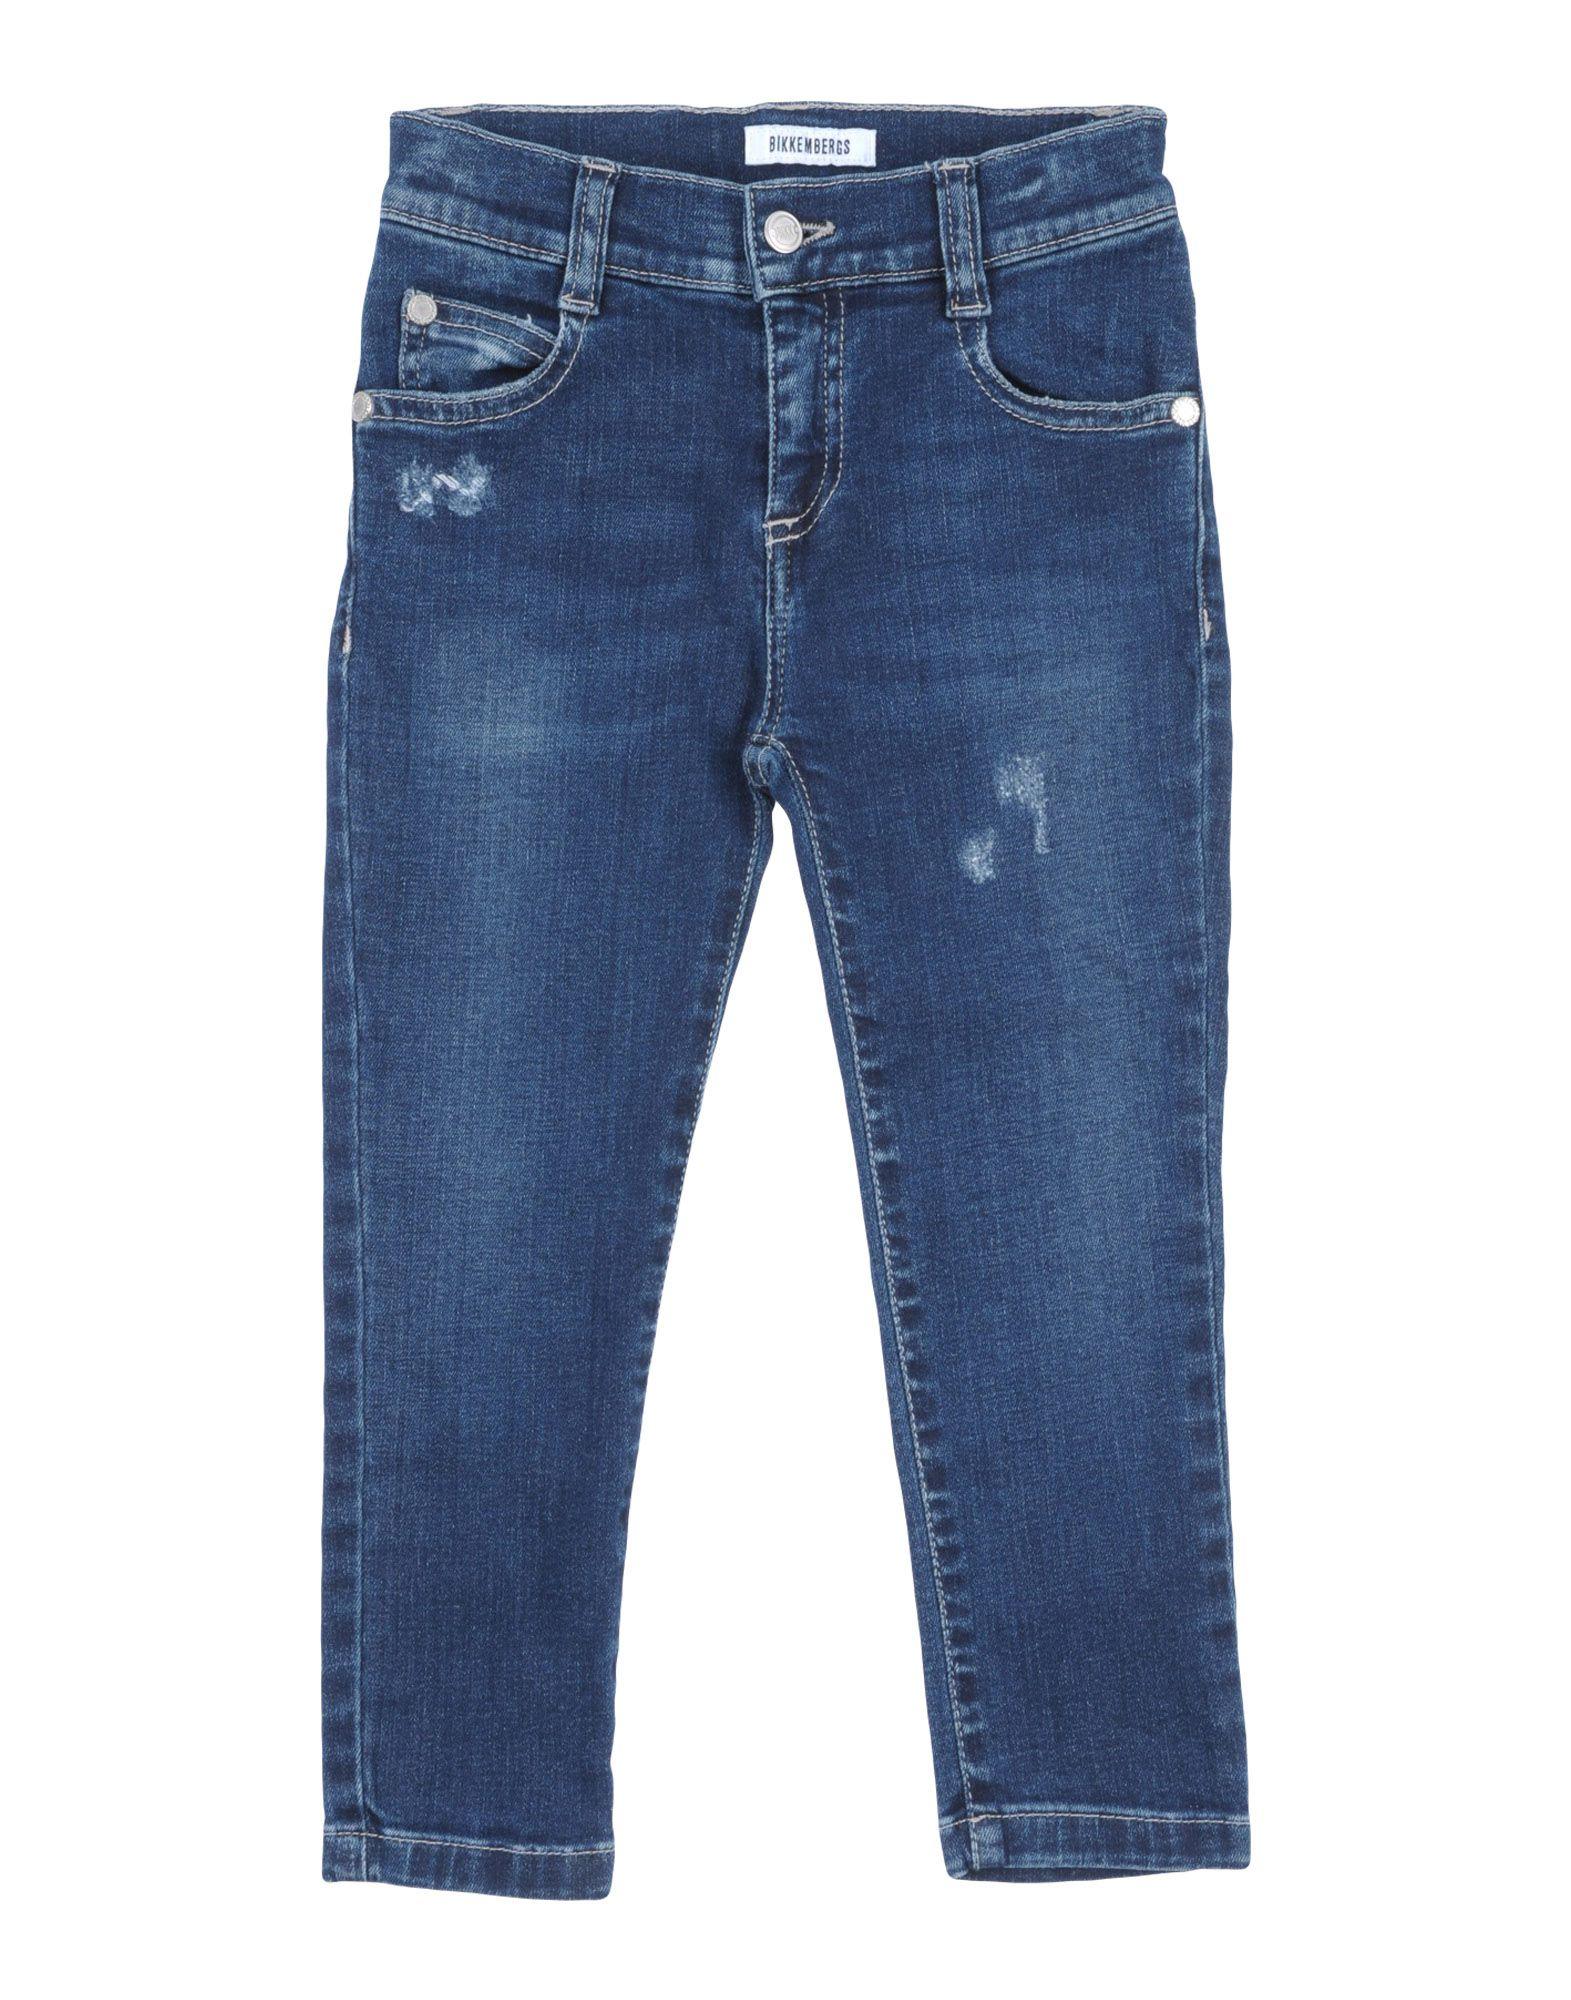 BIKKEMBERGS Джинсовые брюки джинсы bikkembergs c q 61b fj s b093 033b